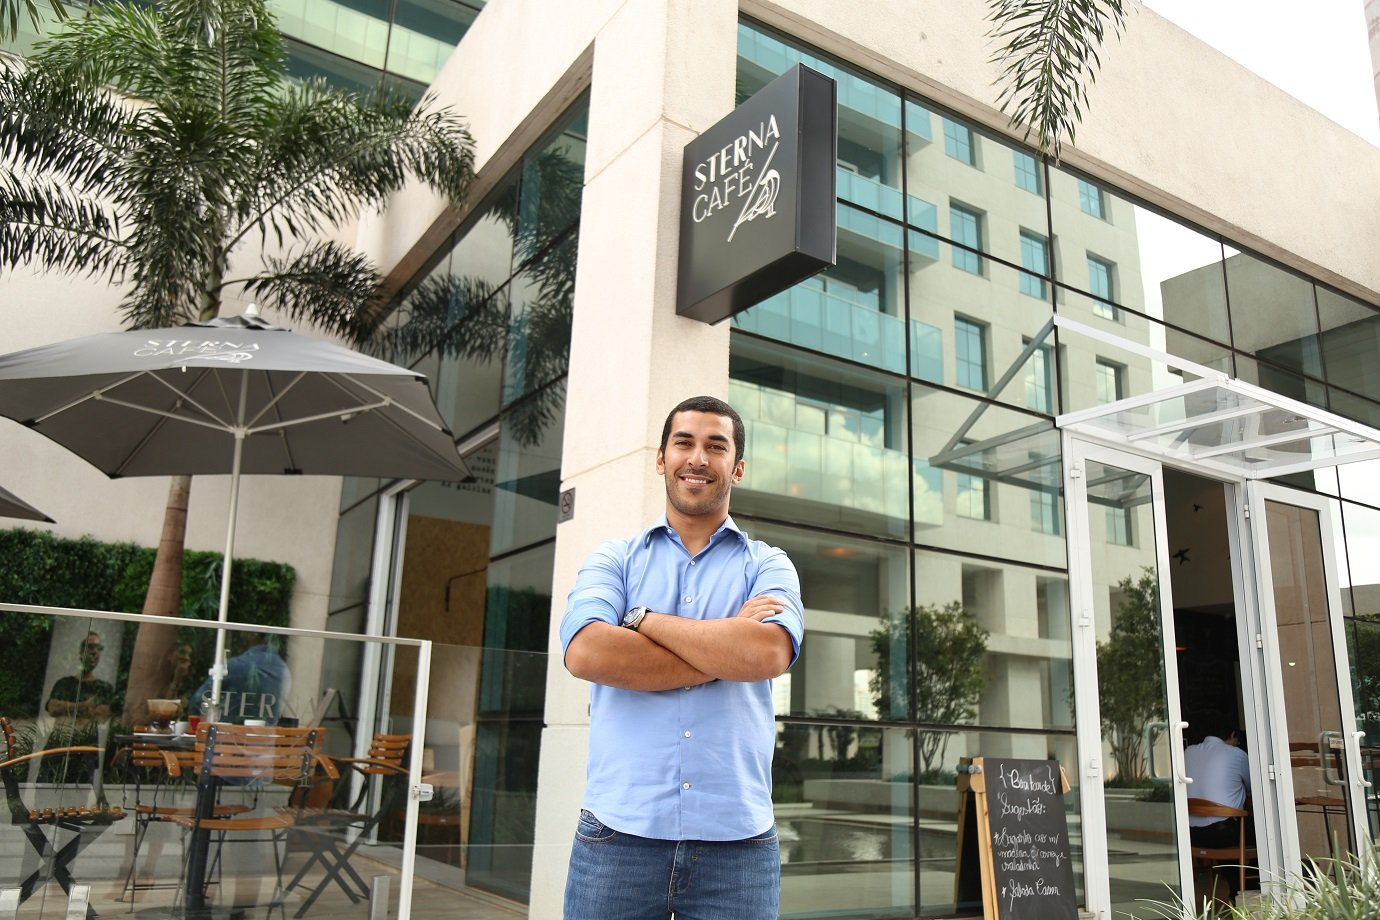 O empreendedor Deiverson Migliati, dono do Sterna Café